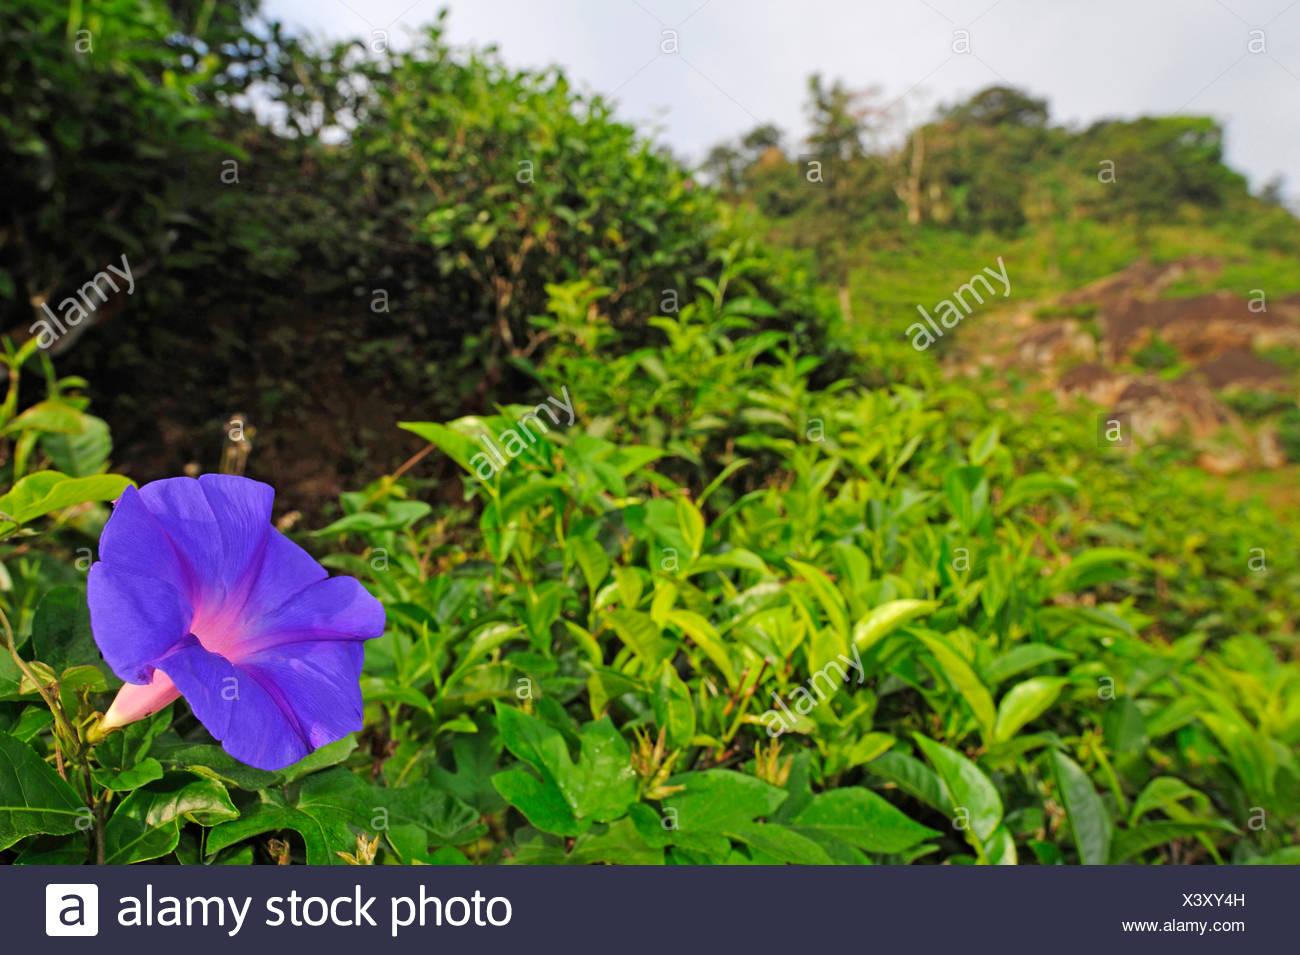 Morning glory ipomoea spec stock photos morning glory ipomoea spec blue dawn flower oceanblue morning glory blue morning glory ipomoea spec izmirmasajfo Choice Image